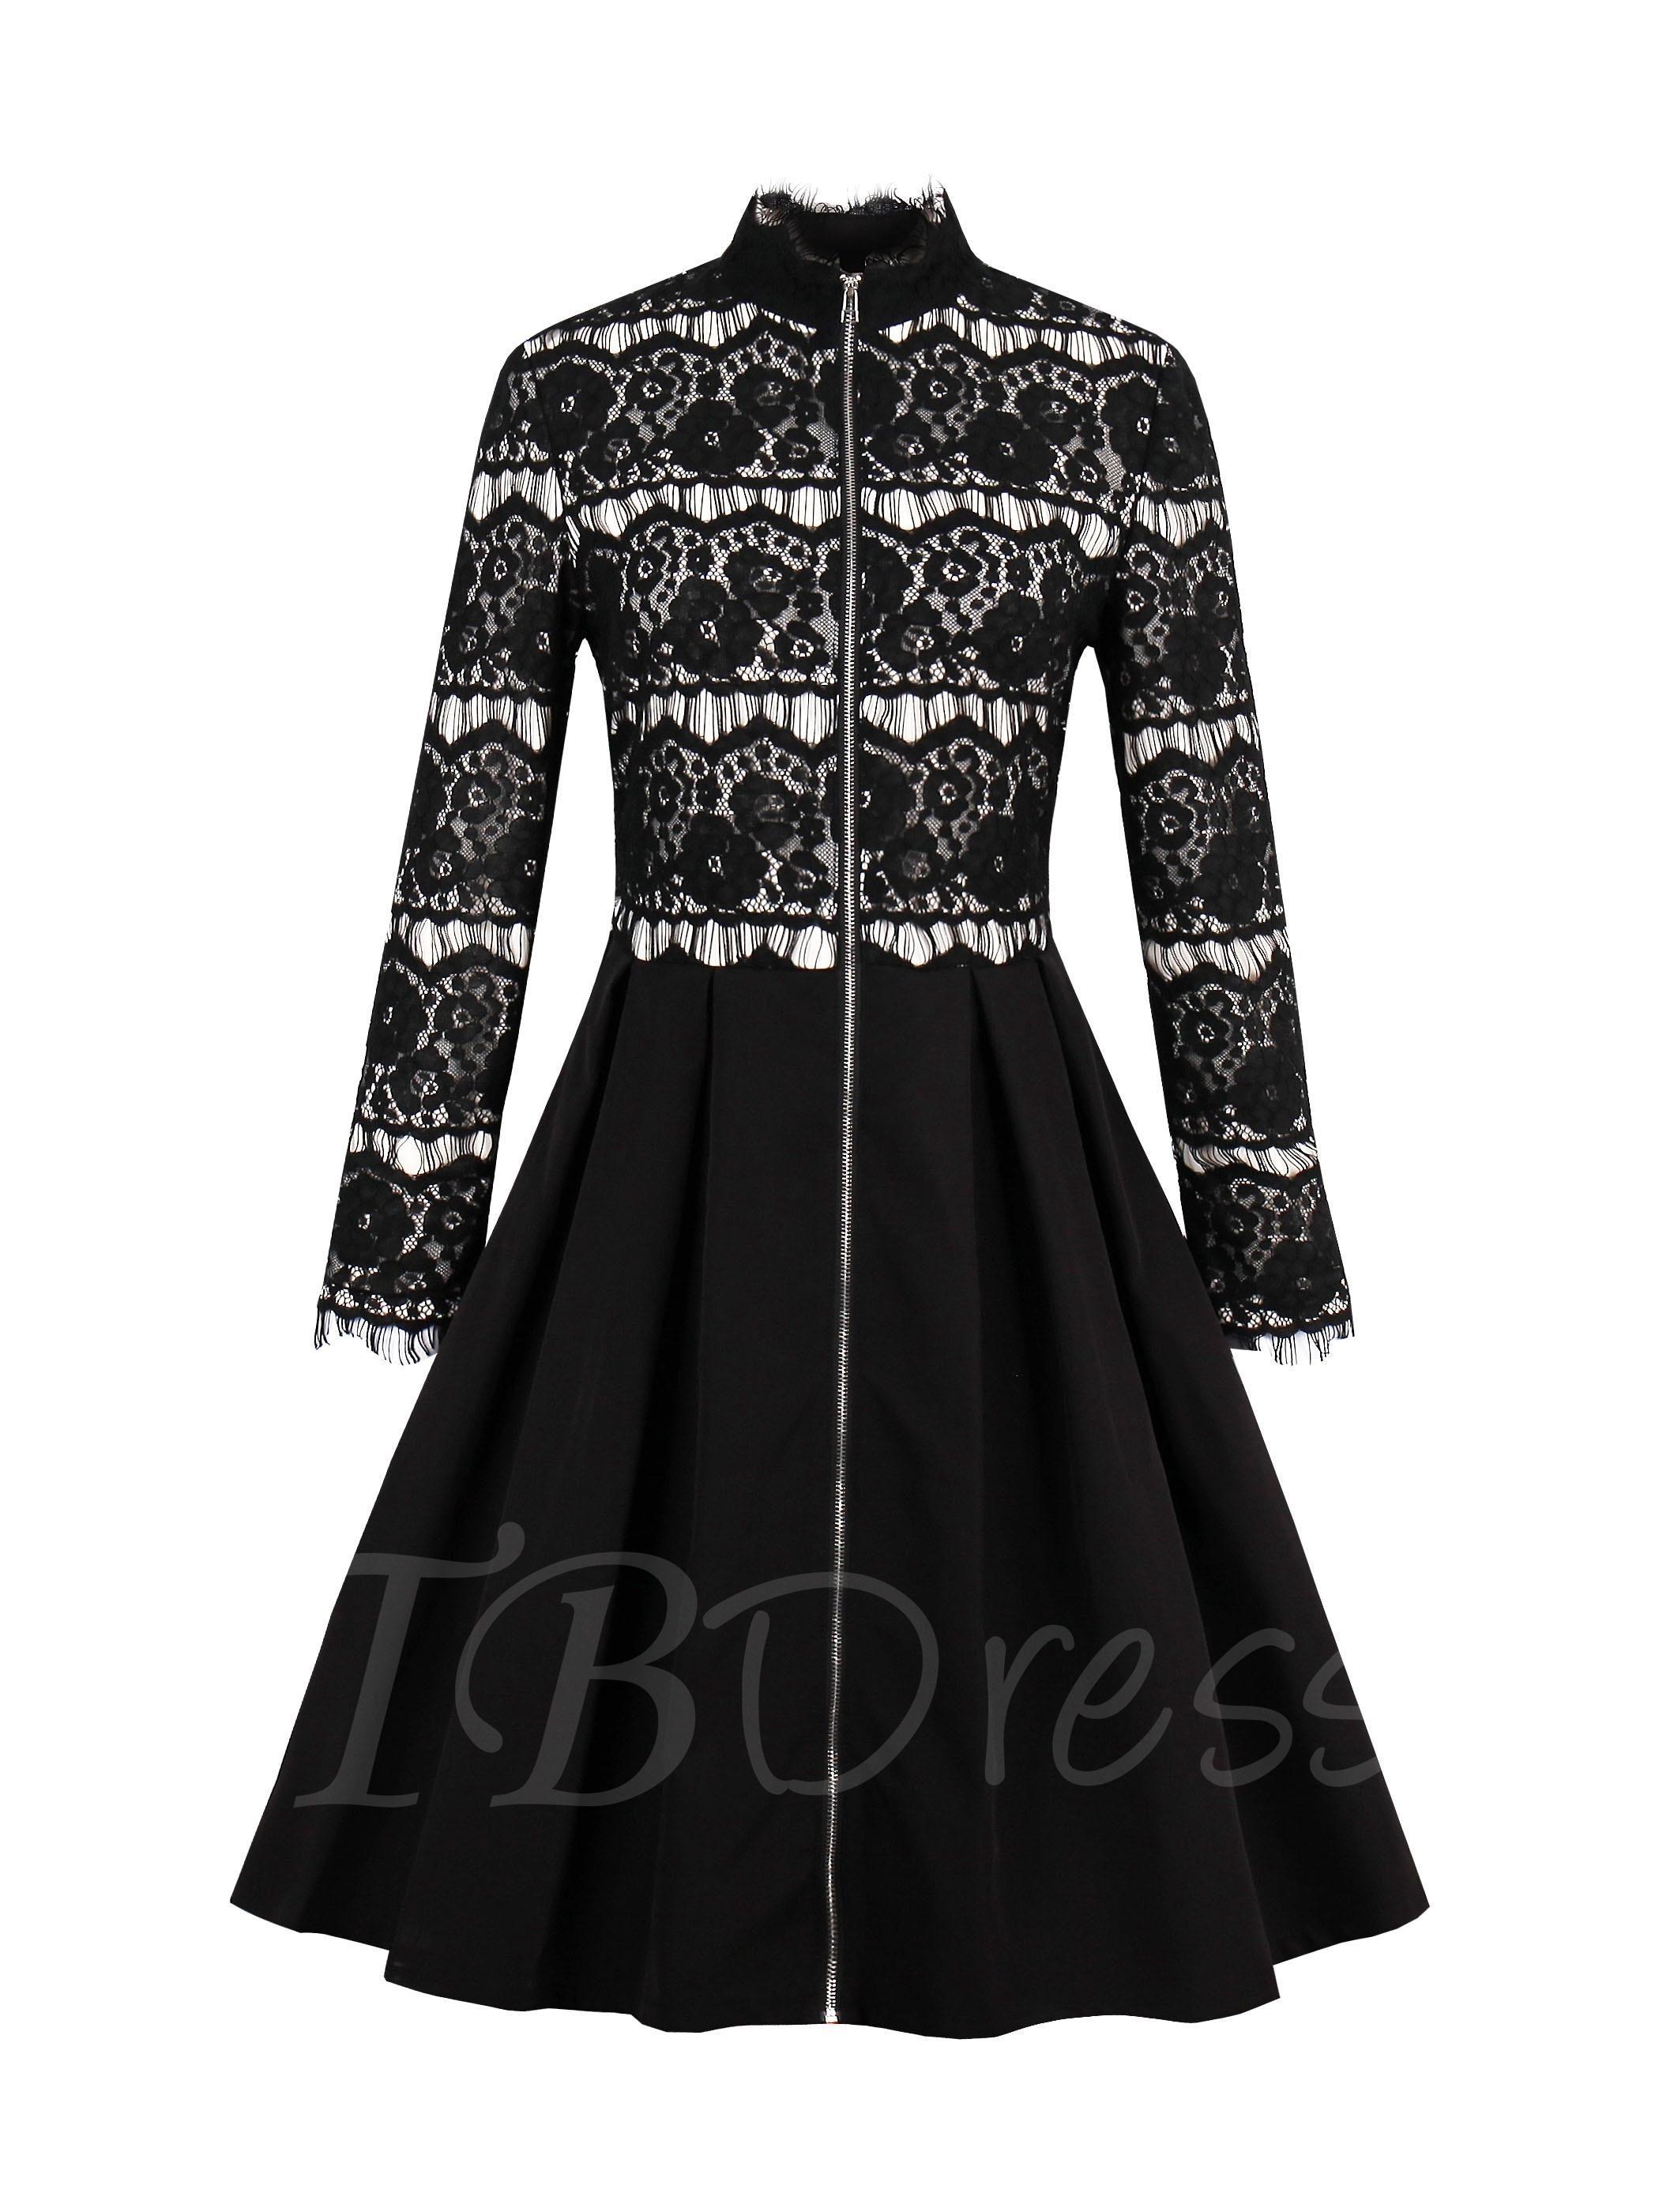 Tbdress tbdress lace patchwork black womens long sleeve dress